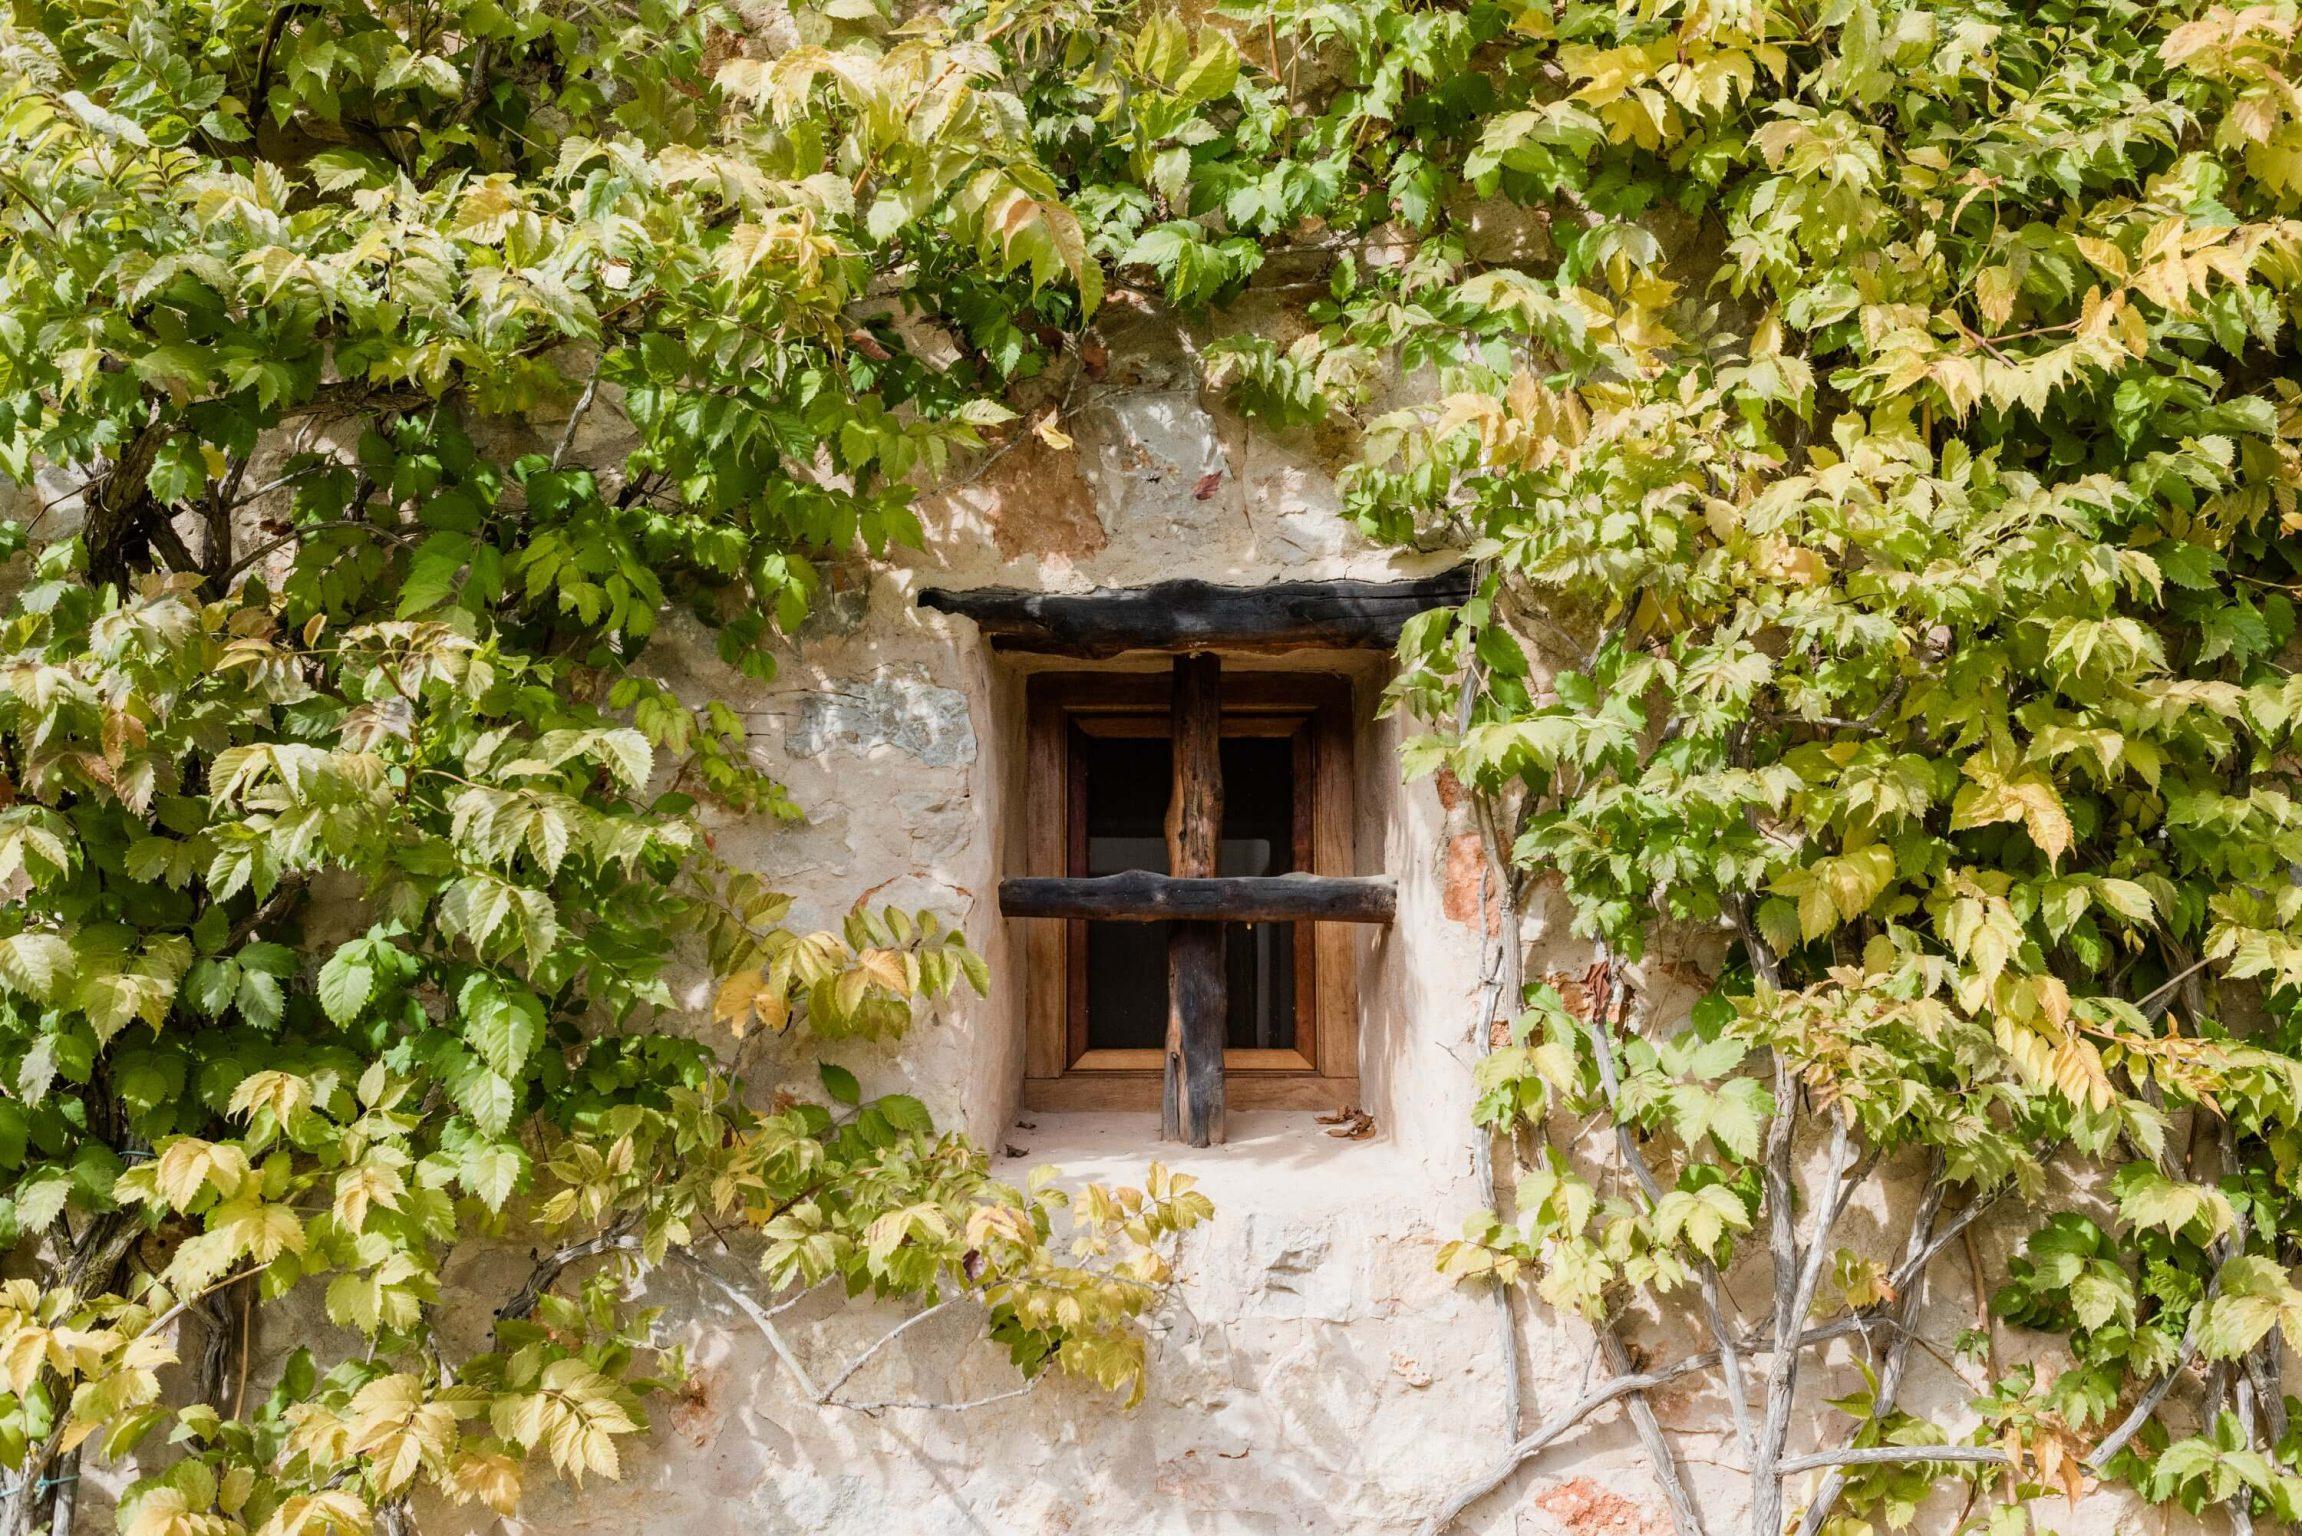 https://www.white-ibiza.com/wp-content/uploads/2020/05/white-ibiza-villas-can-sabina-exterior-window-2302x1536.jpg